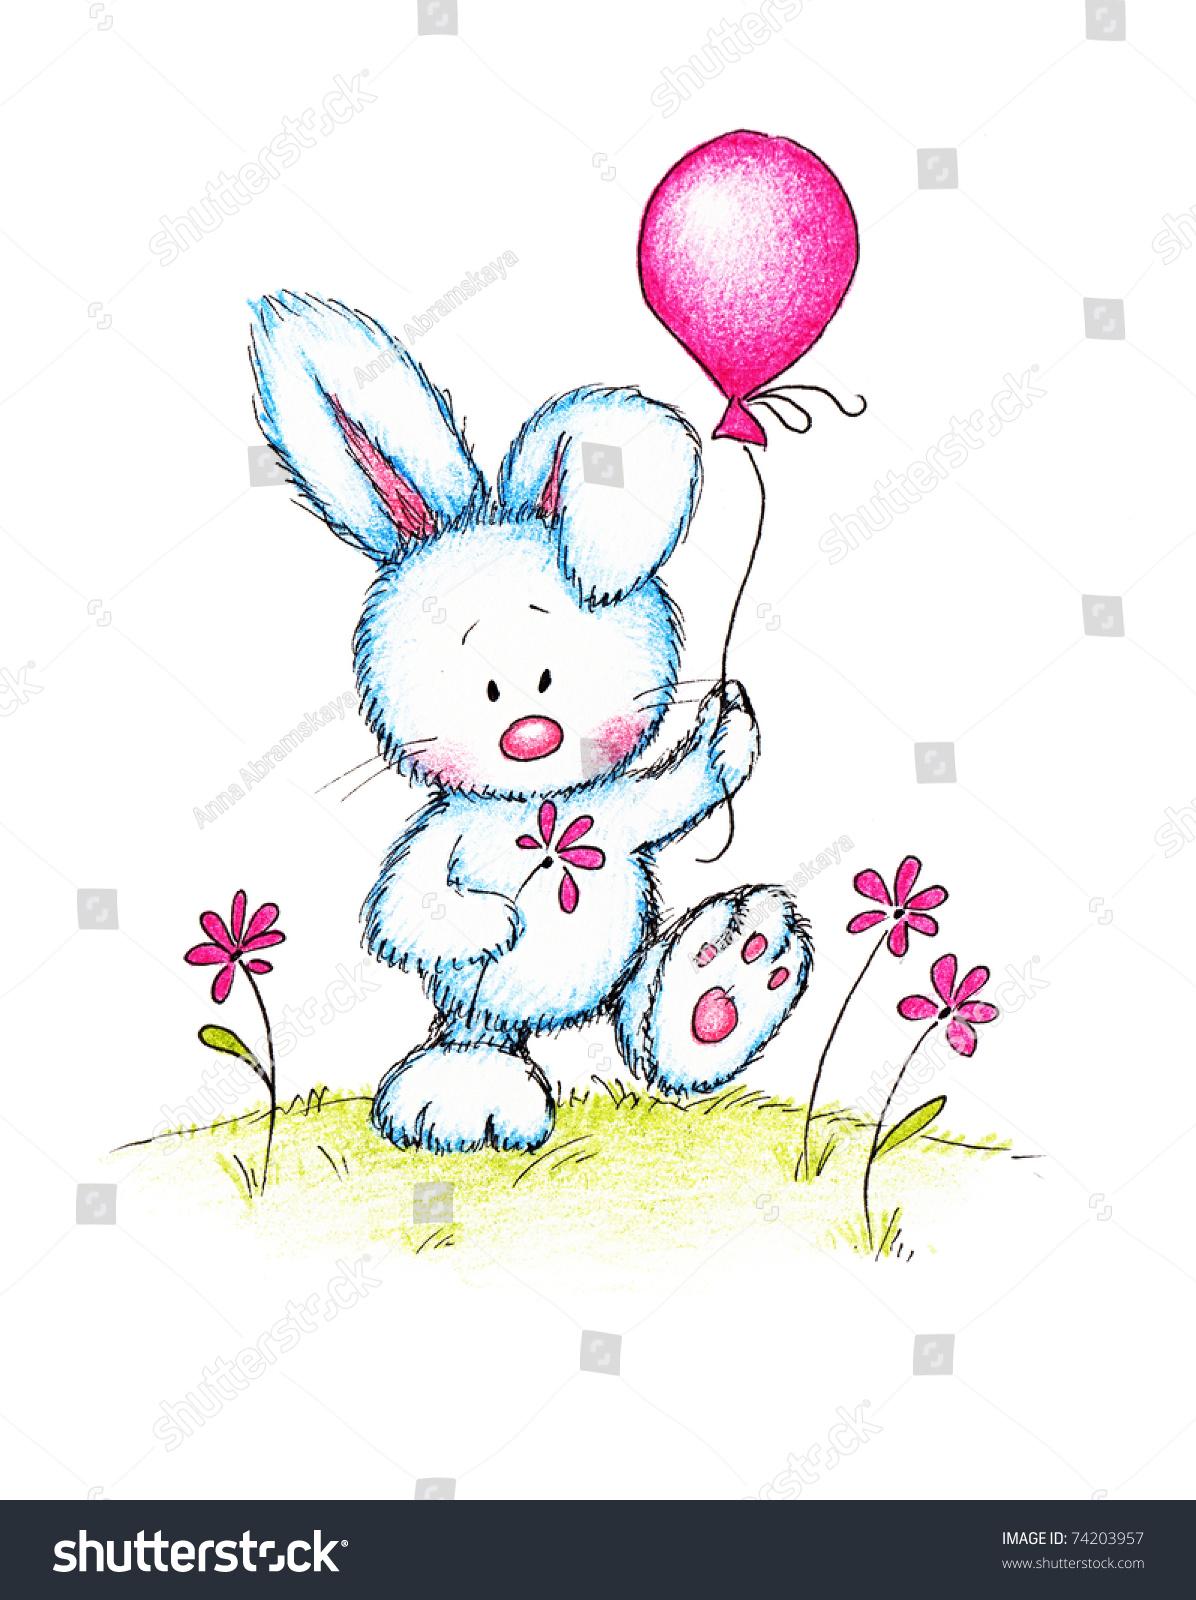 Открытка заяц с шариками